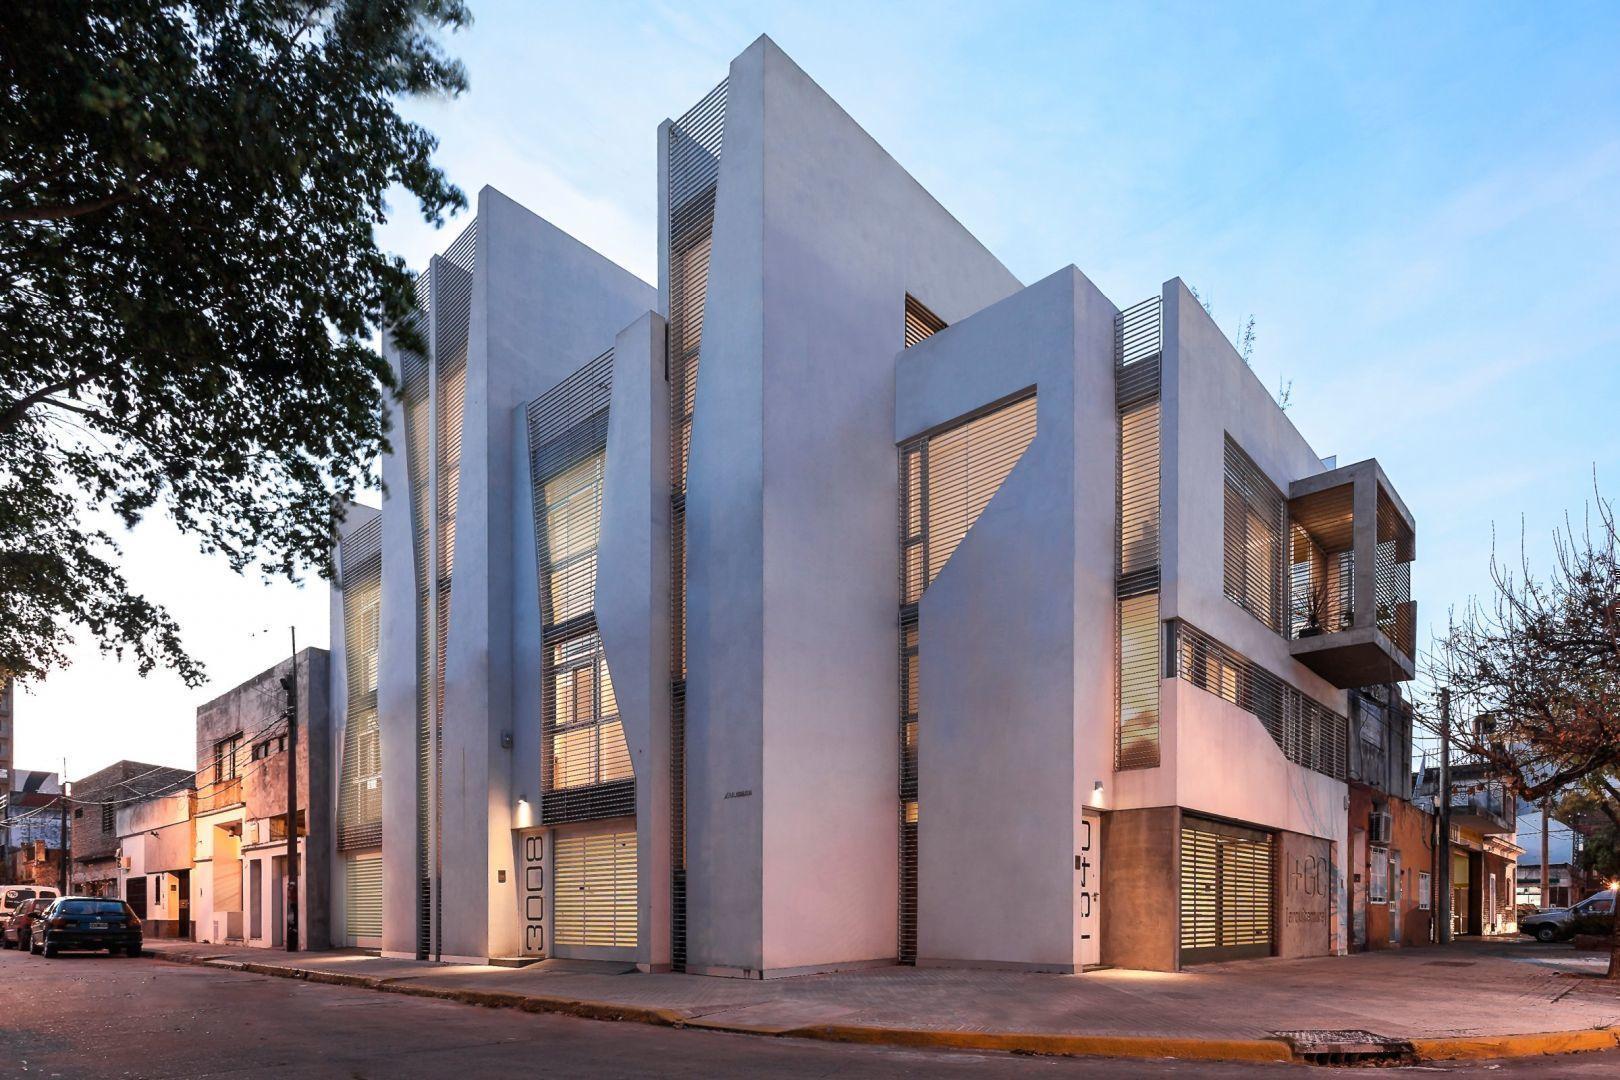 Ph casas en rosario arqa for Arquitectura rosario